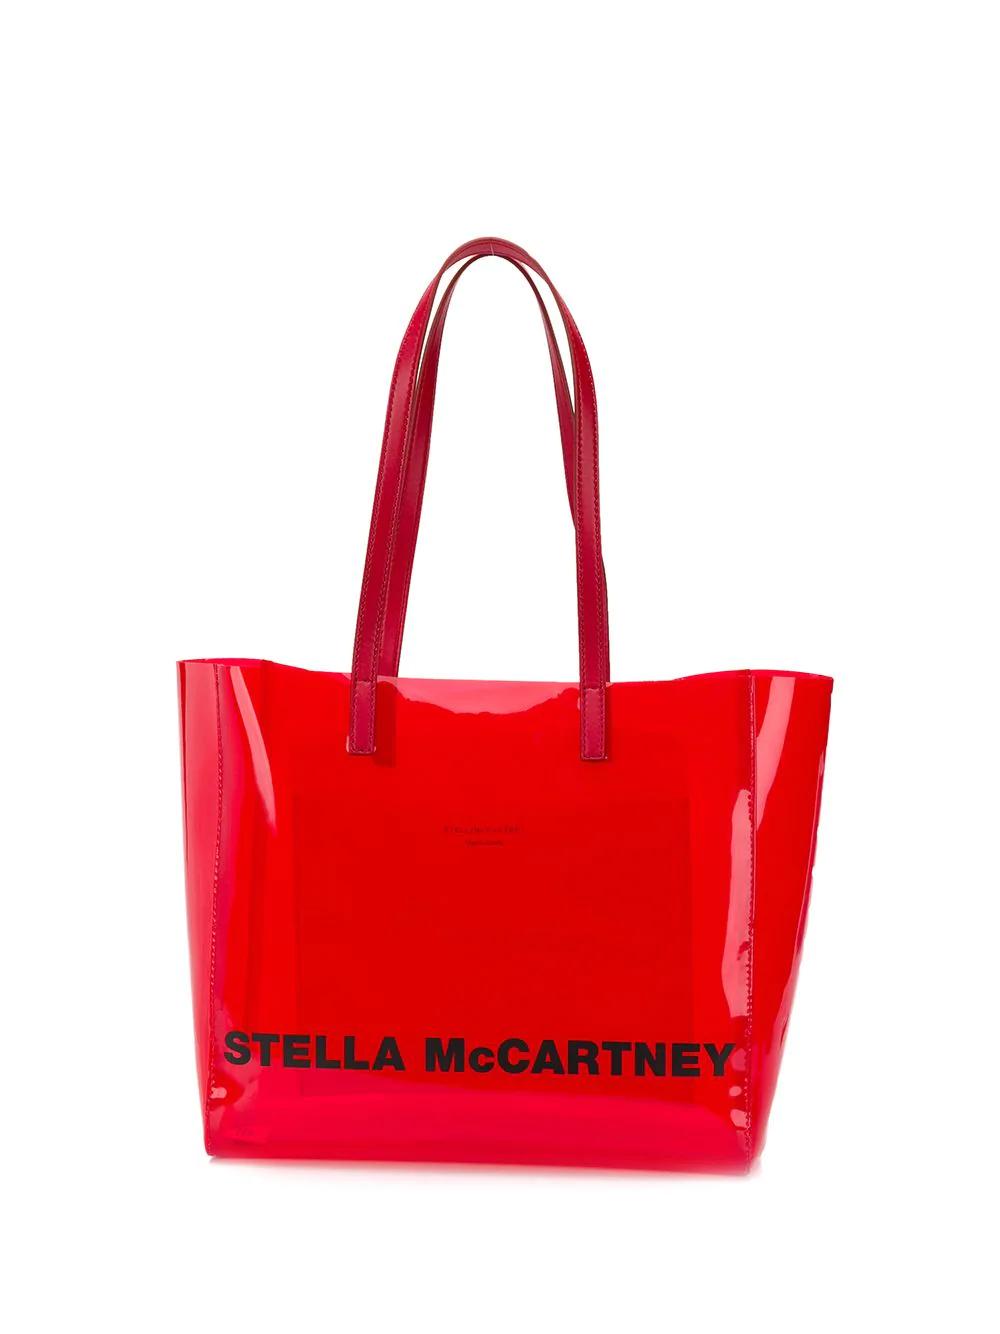 Stella Mccartney Logo Print Small Tote - Red  194bf72d150b5